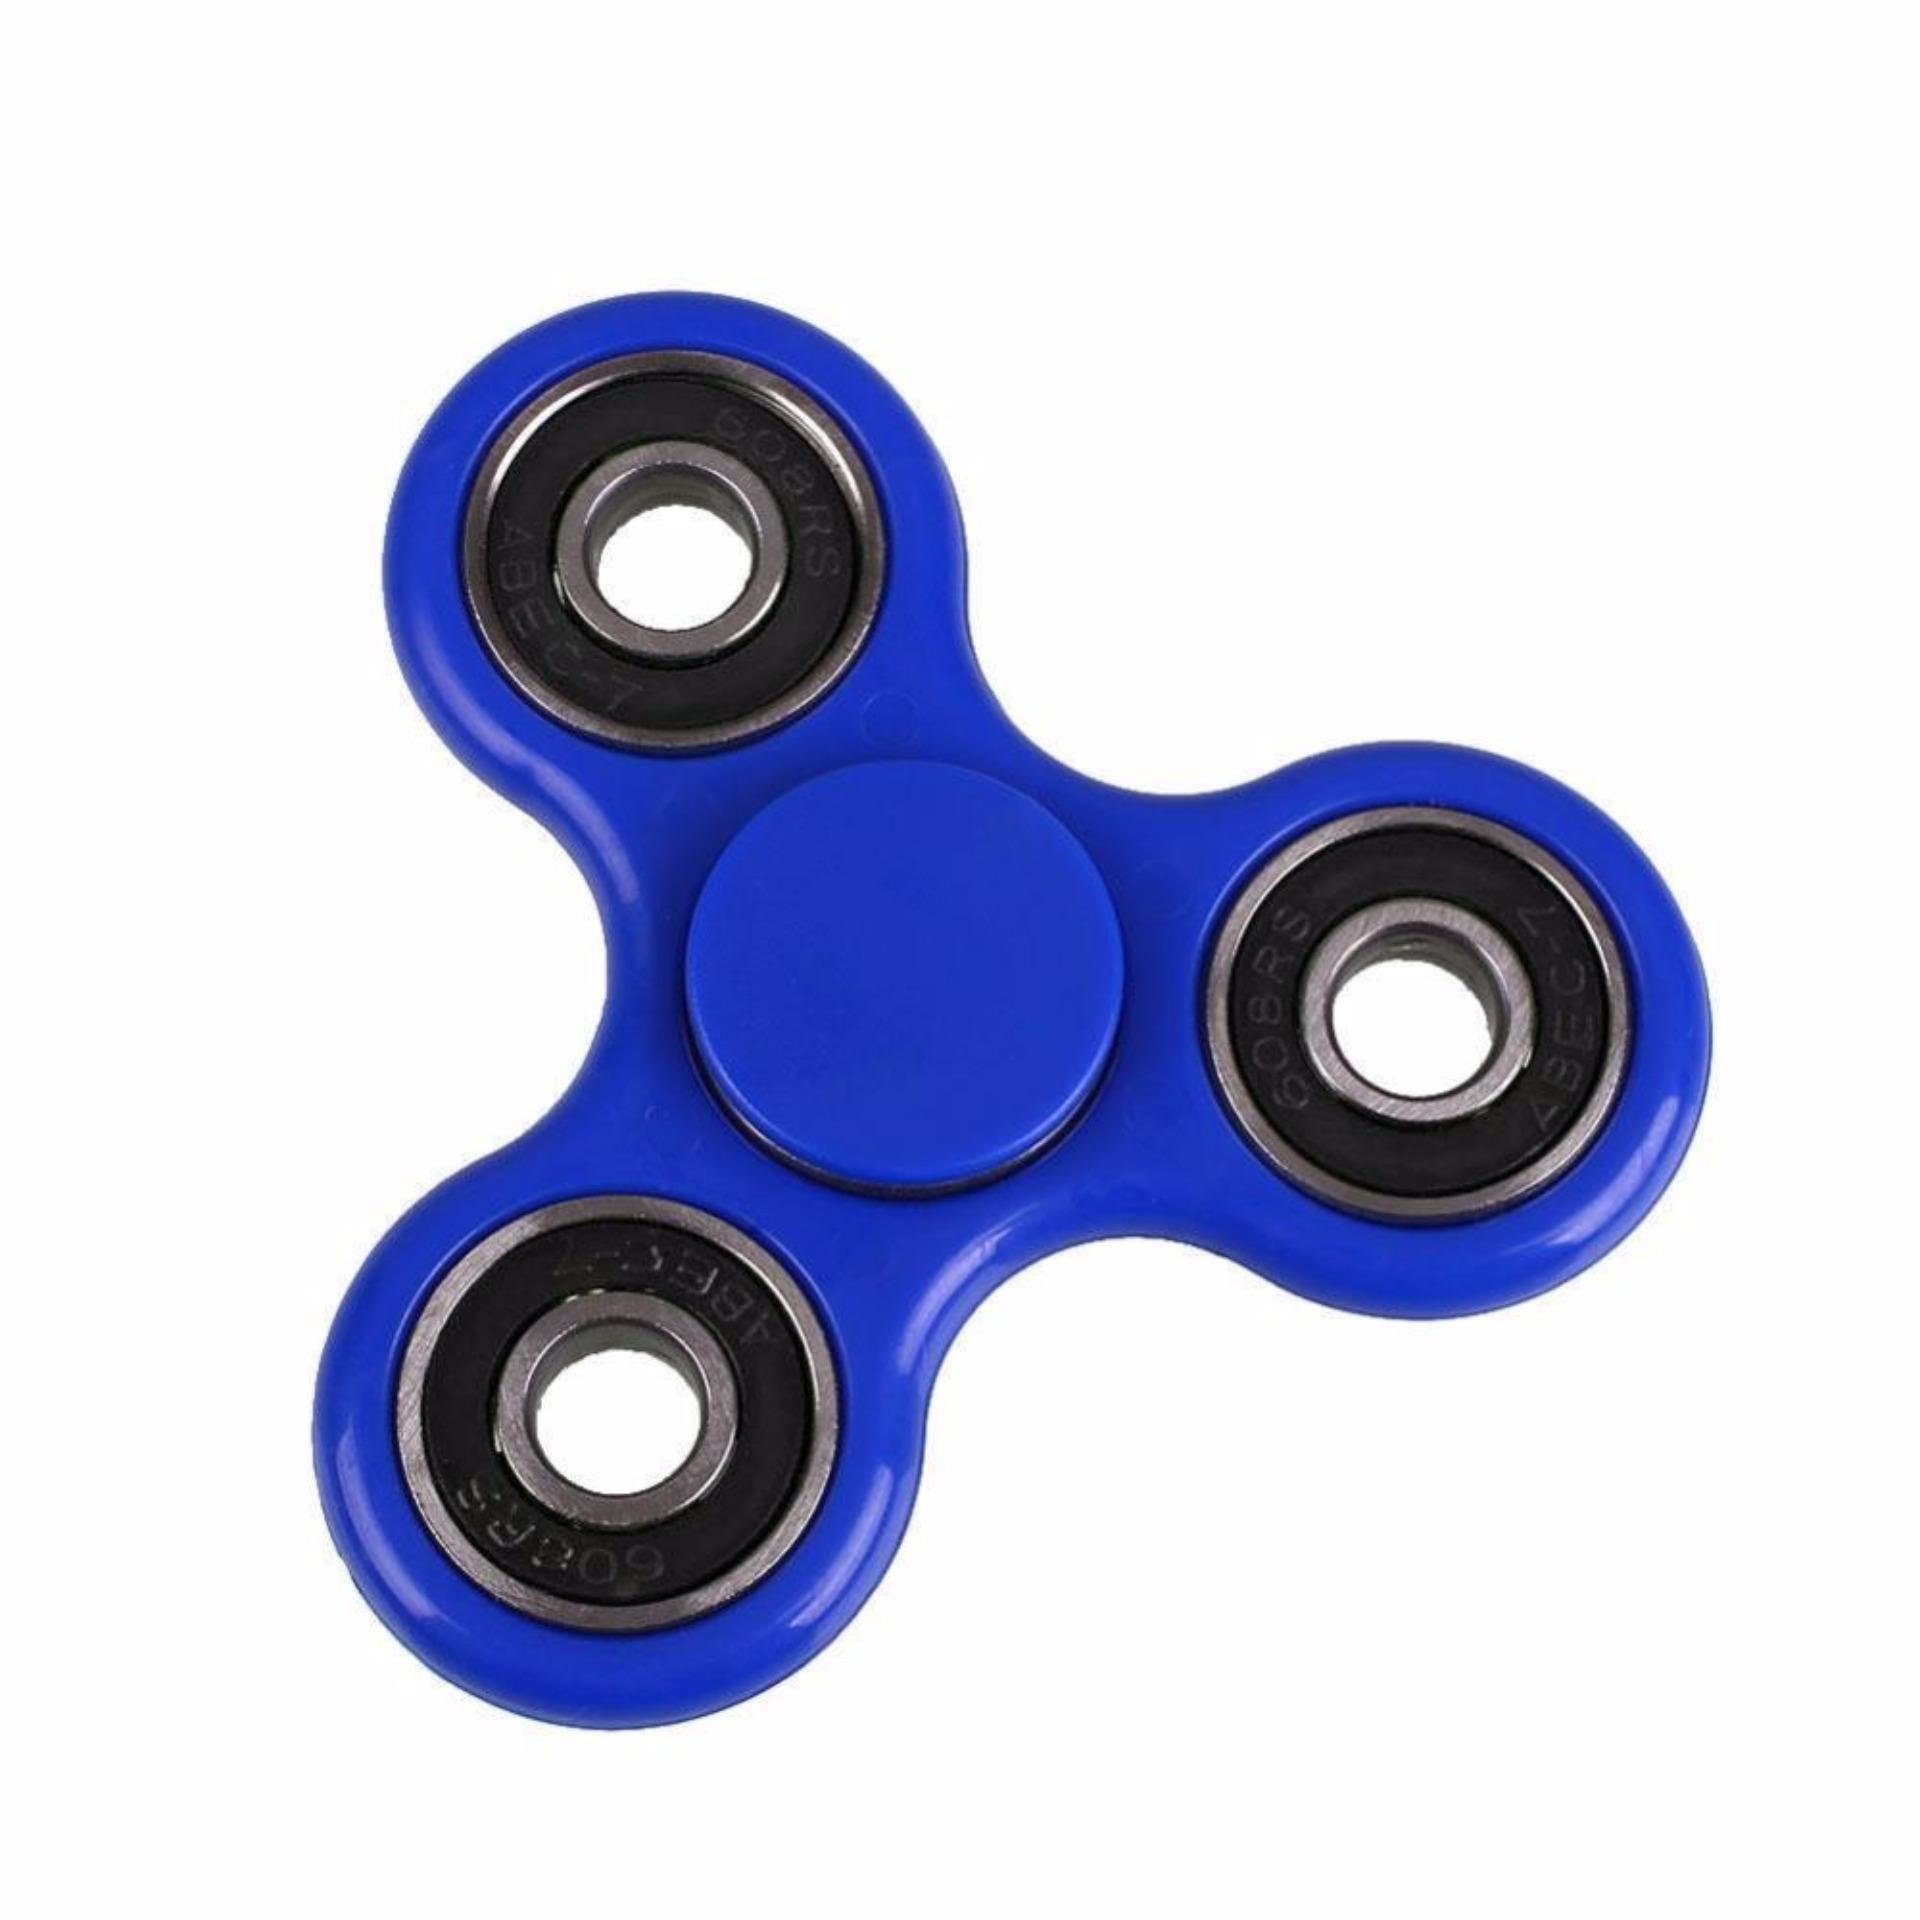 ... Warna Random Free. Source · Fidget Spinner Hand Toys Mainan Tri-Spinner EDC Ceramic Ball Focus Games .